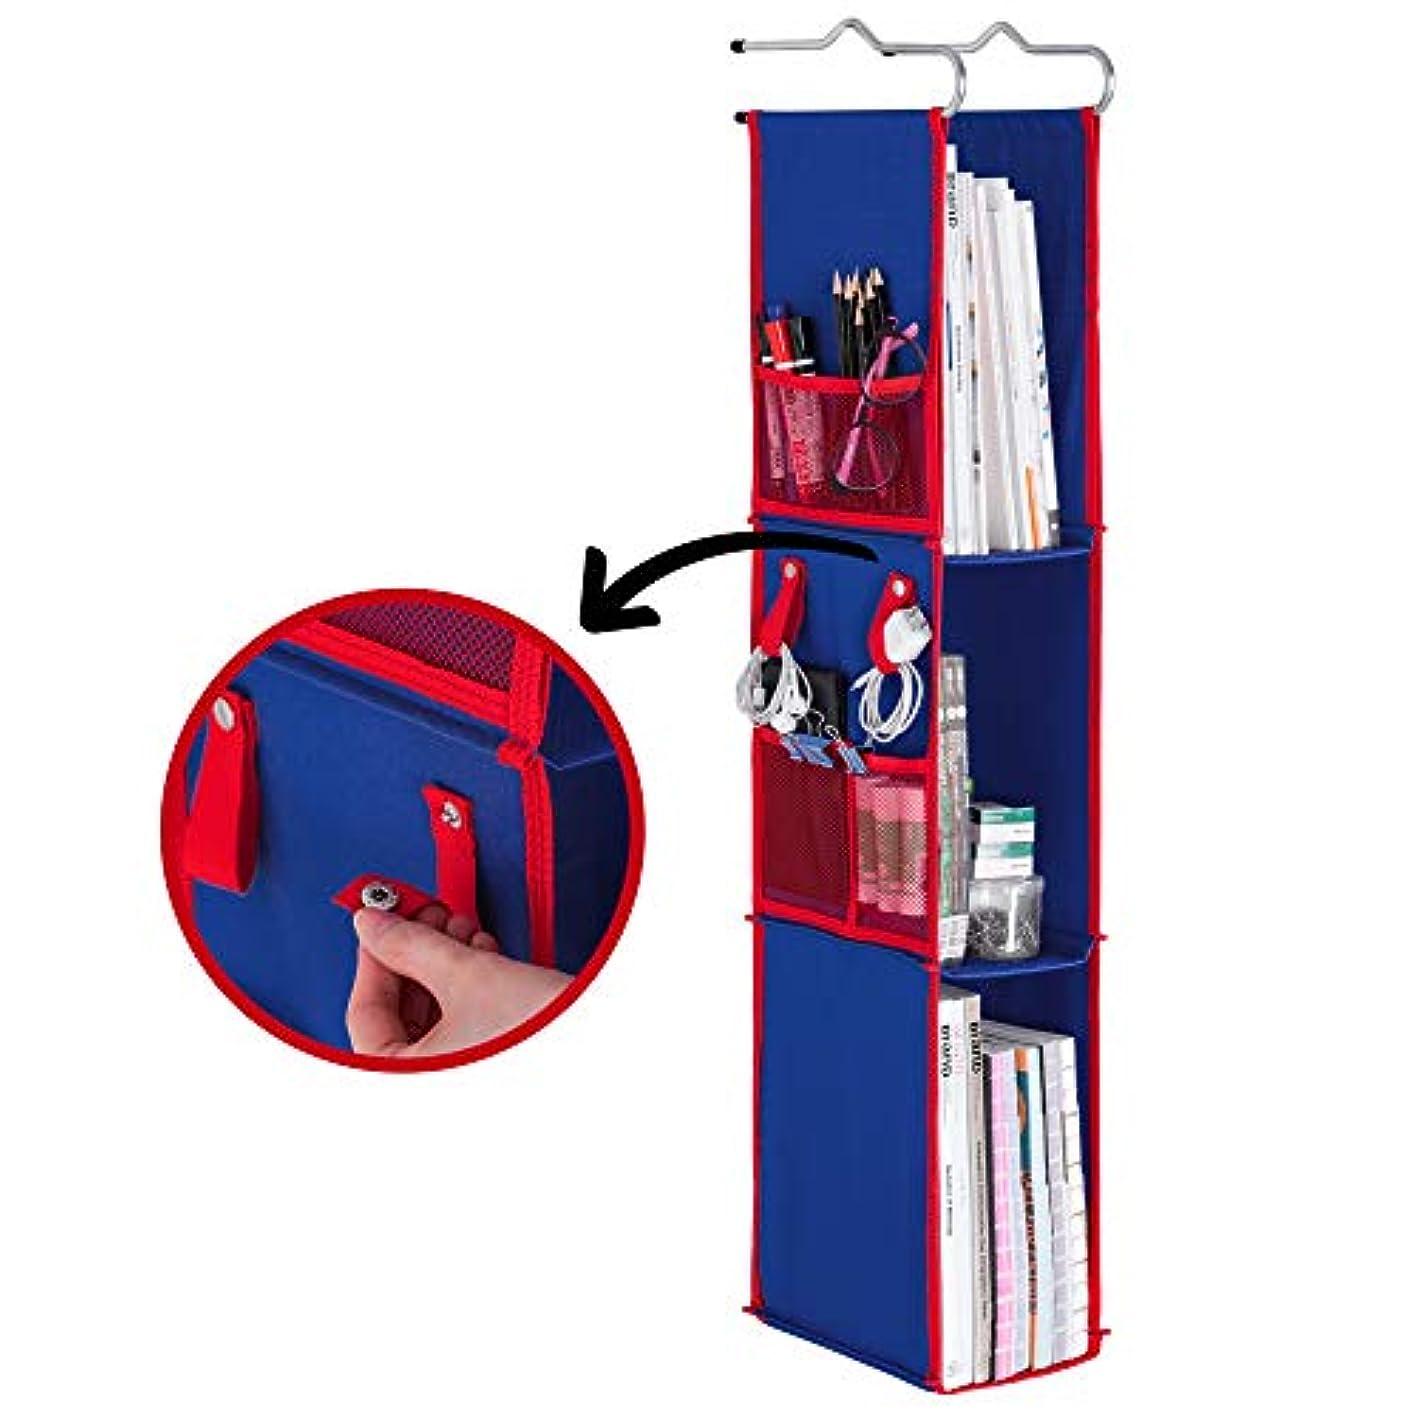 StorageWorks 3-Shelf Hanging Locker Organizer, Durable Polyester Canvas Locker Organizer Hanging Shelves, Blue/Red, 36